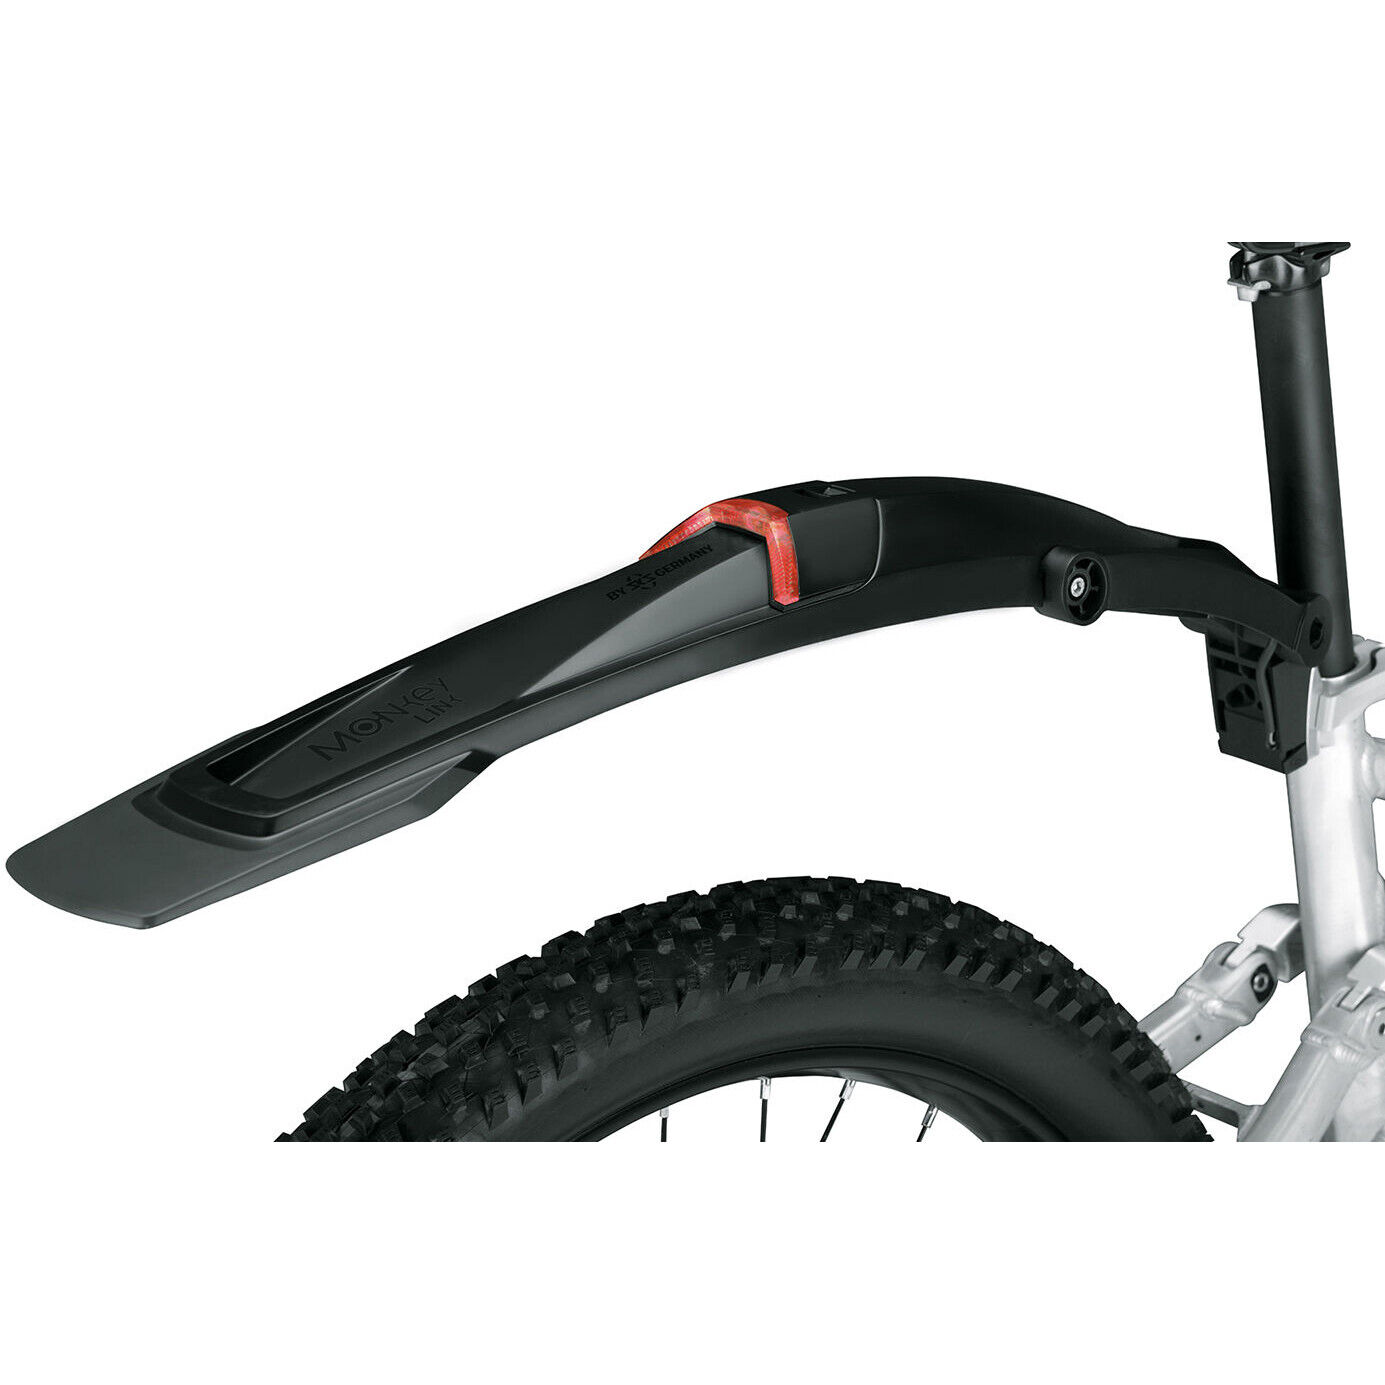 MONKEY LINK MonkeyLight 70 Lux LED e-Bike Fahrradlampen Set